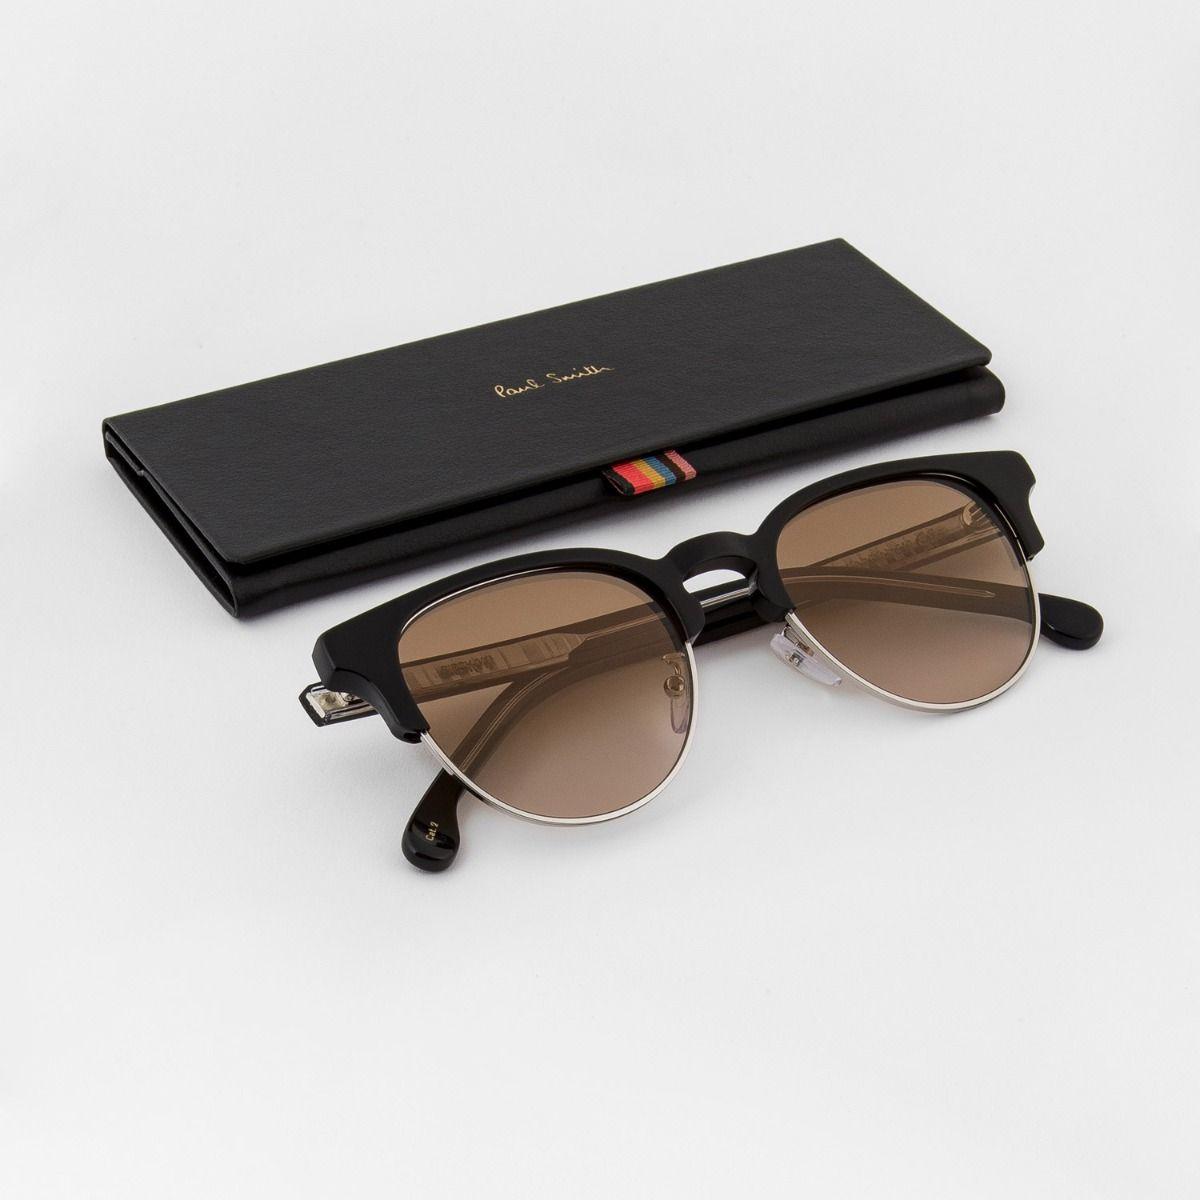 Paul Smith Birch Round Sunglasses